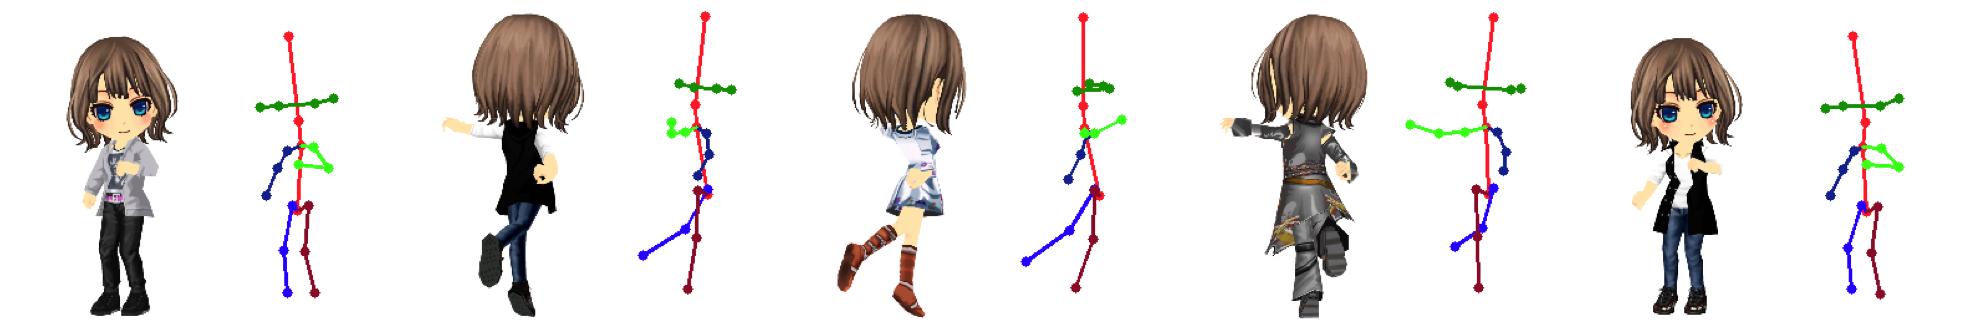 full body high resolution anime generation with progressive